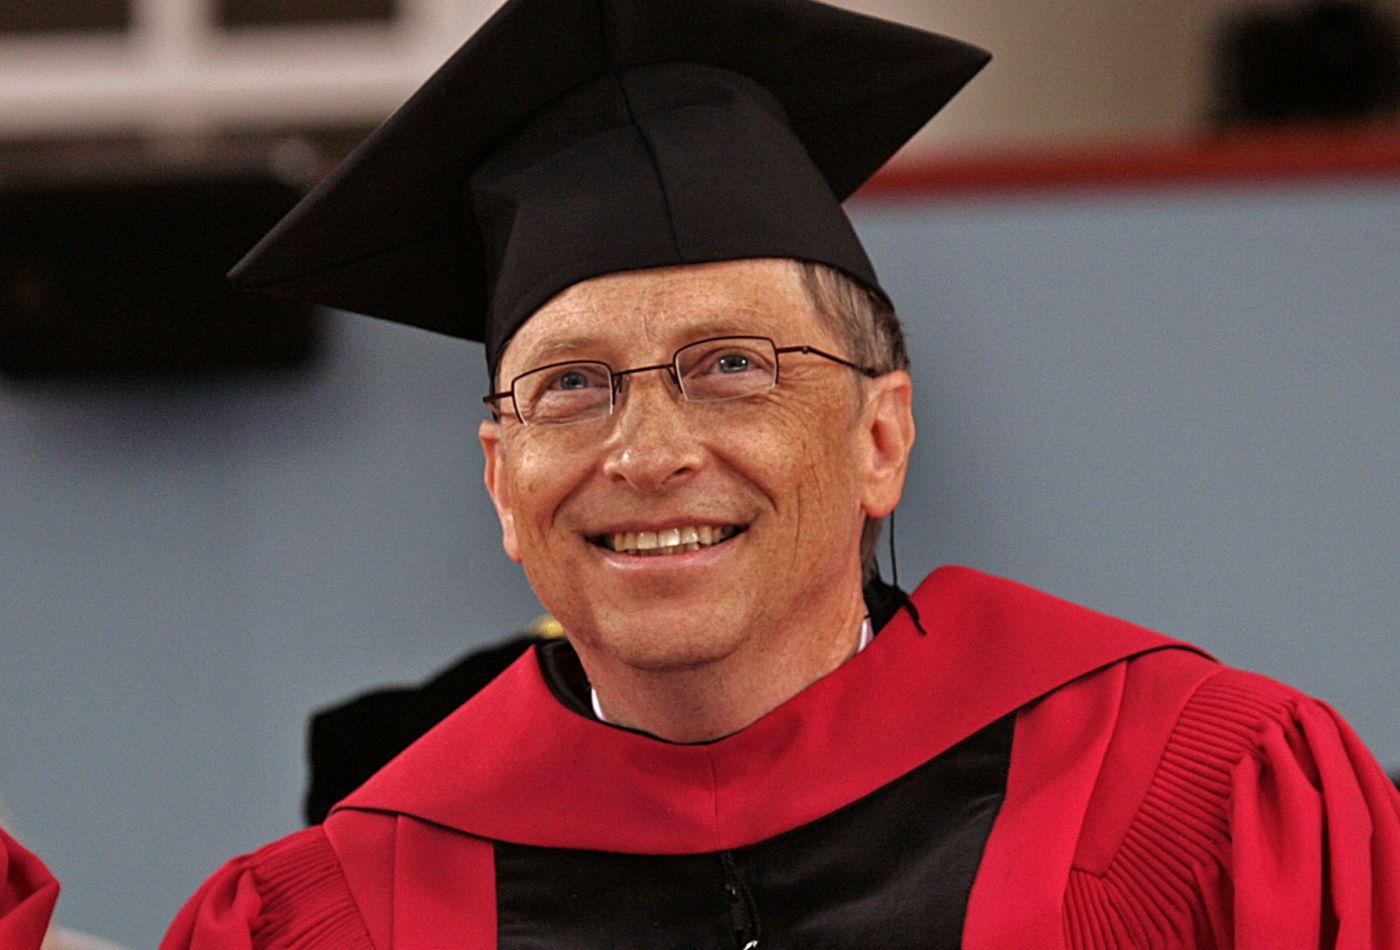 Bill gates Doctorate degree at Harvard University